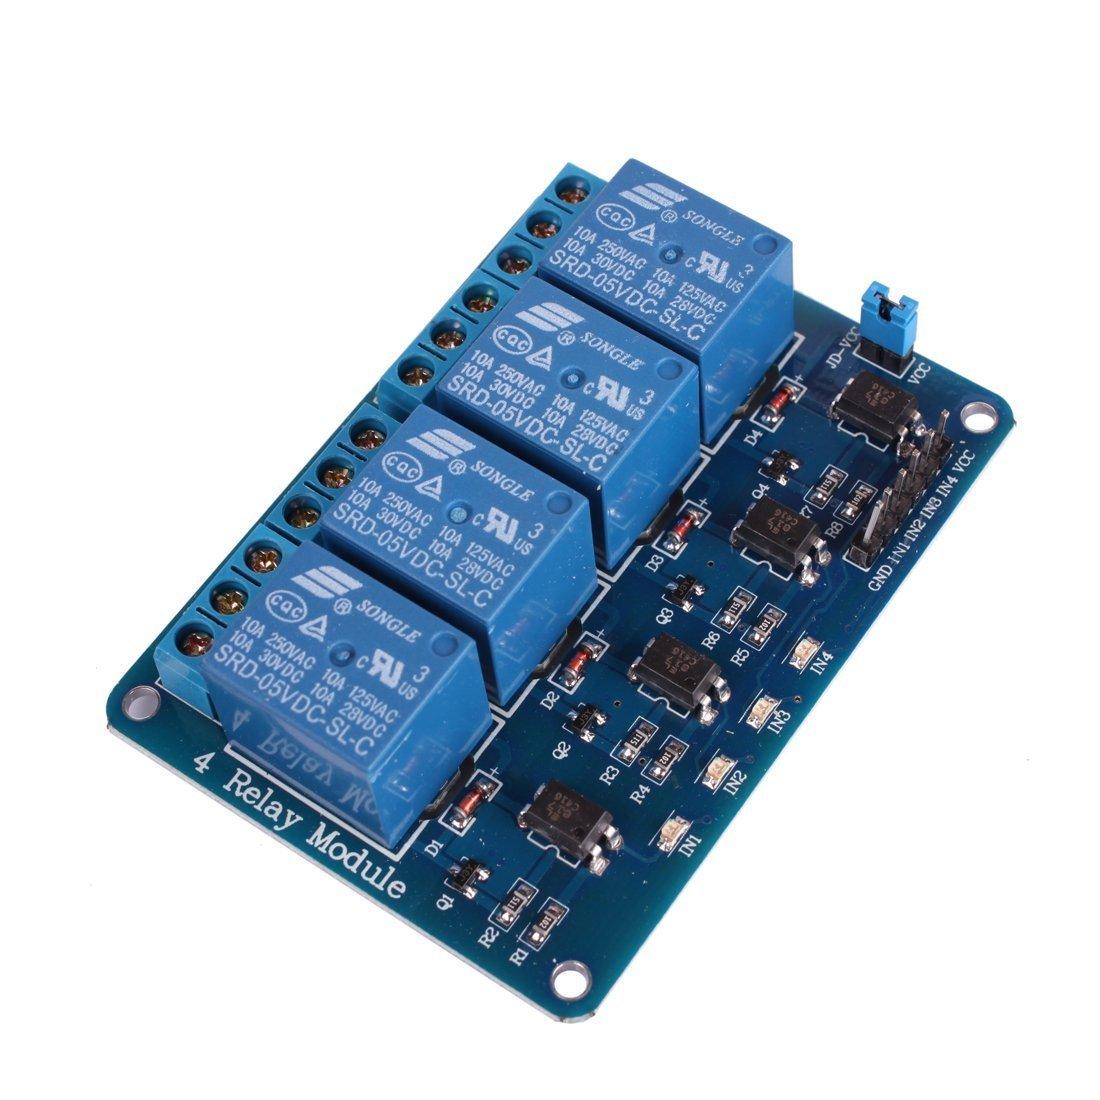 Electrobot Eb 4ch5v Rebimp Channel Dc 5v Relay Module Breadboard Circuit Test Board Rees52 Industrial Scientific